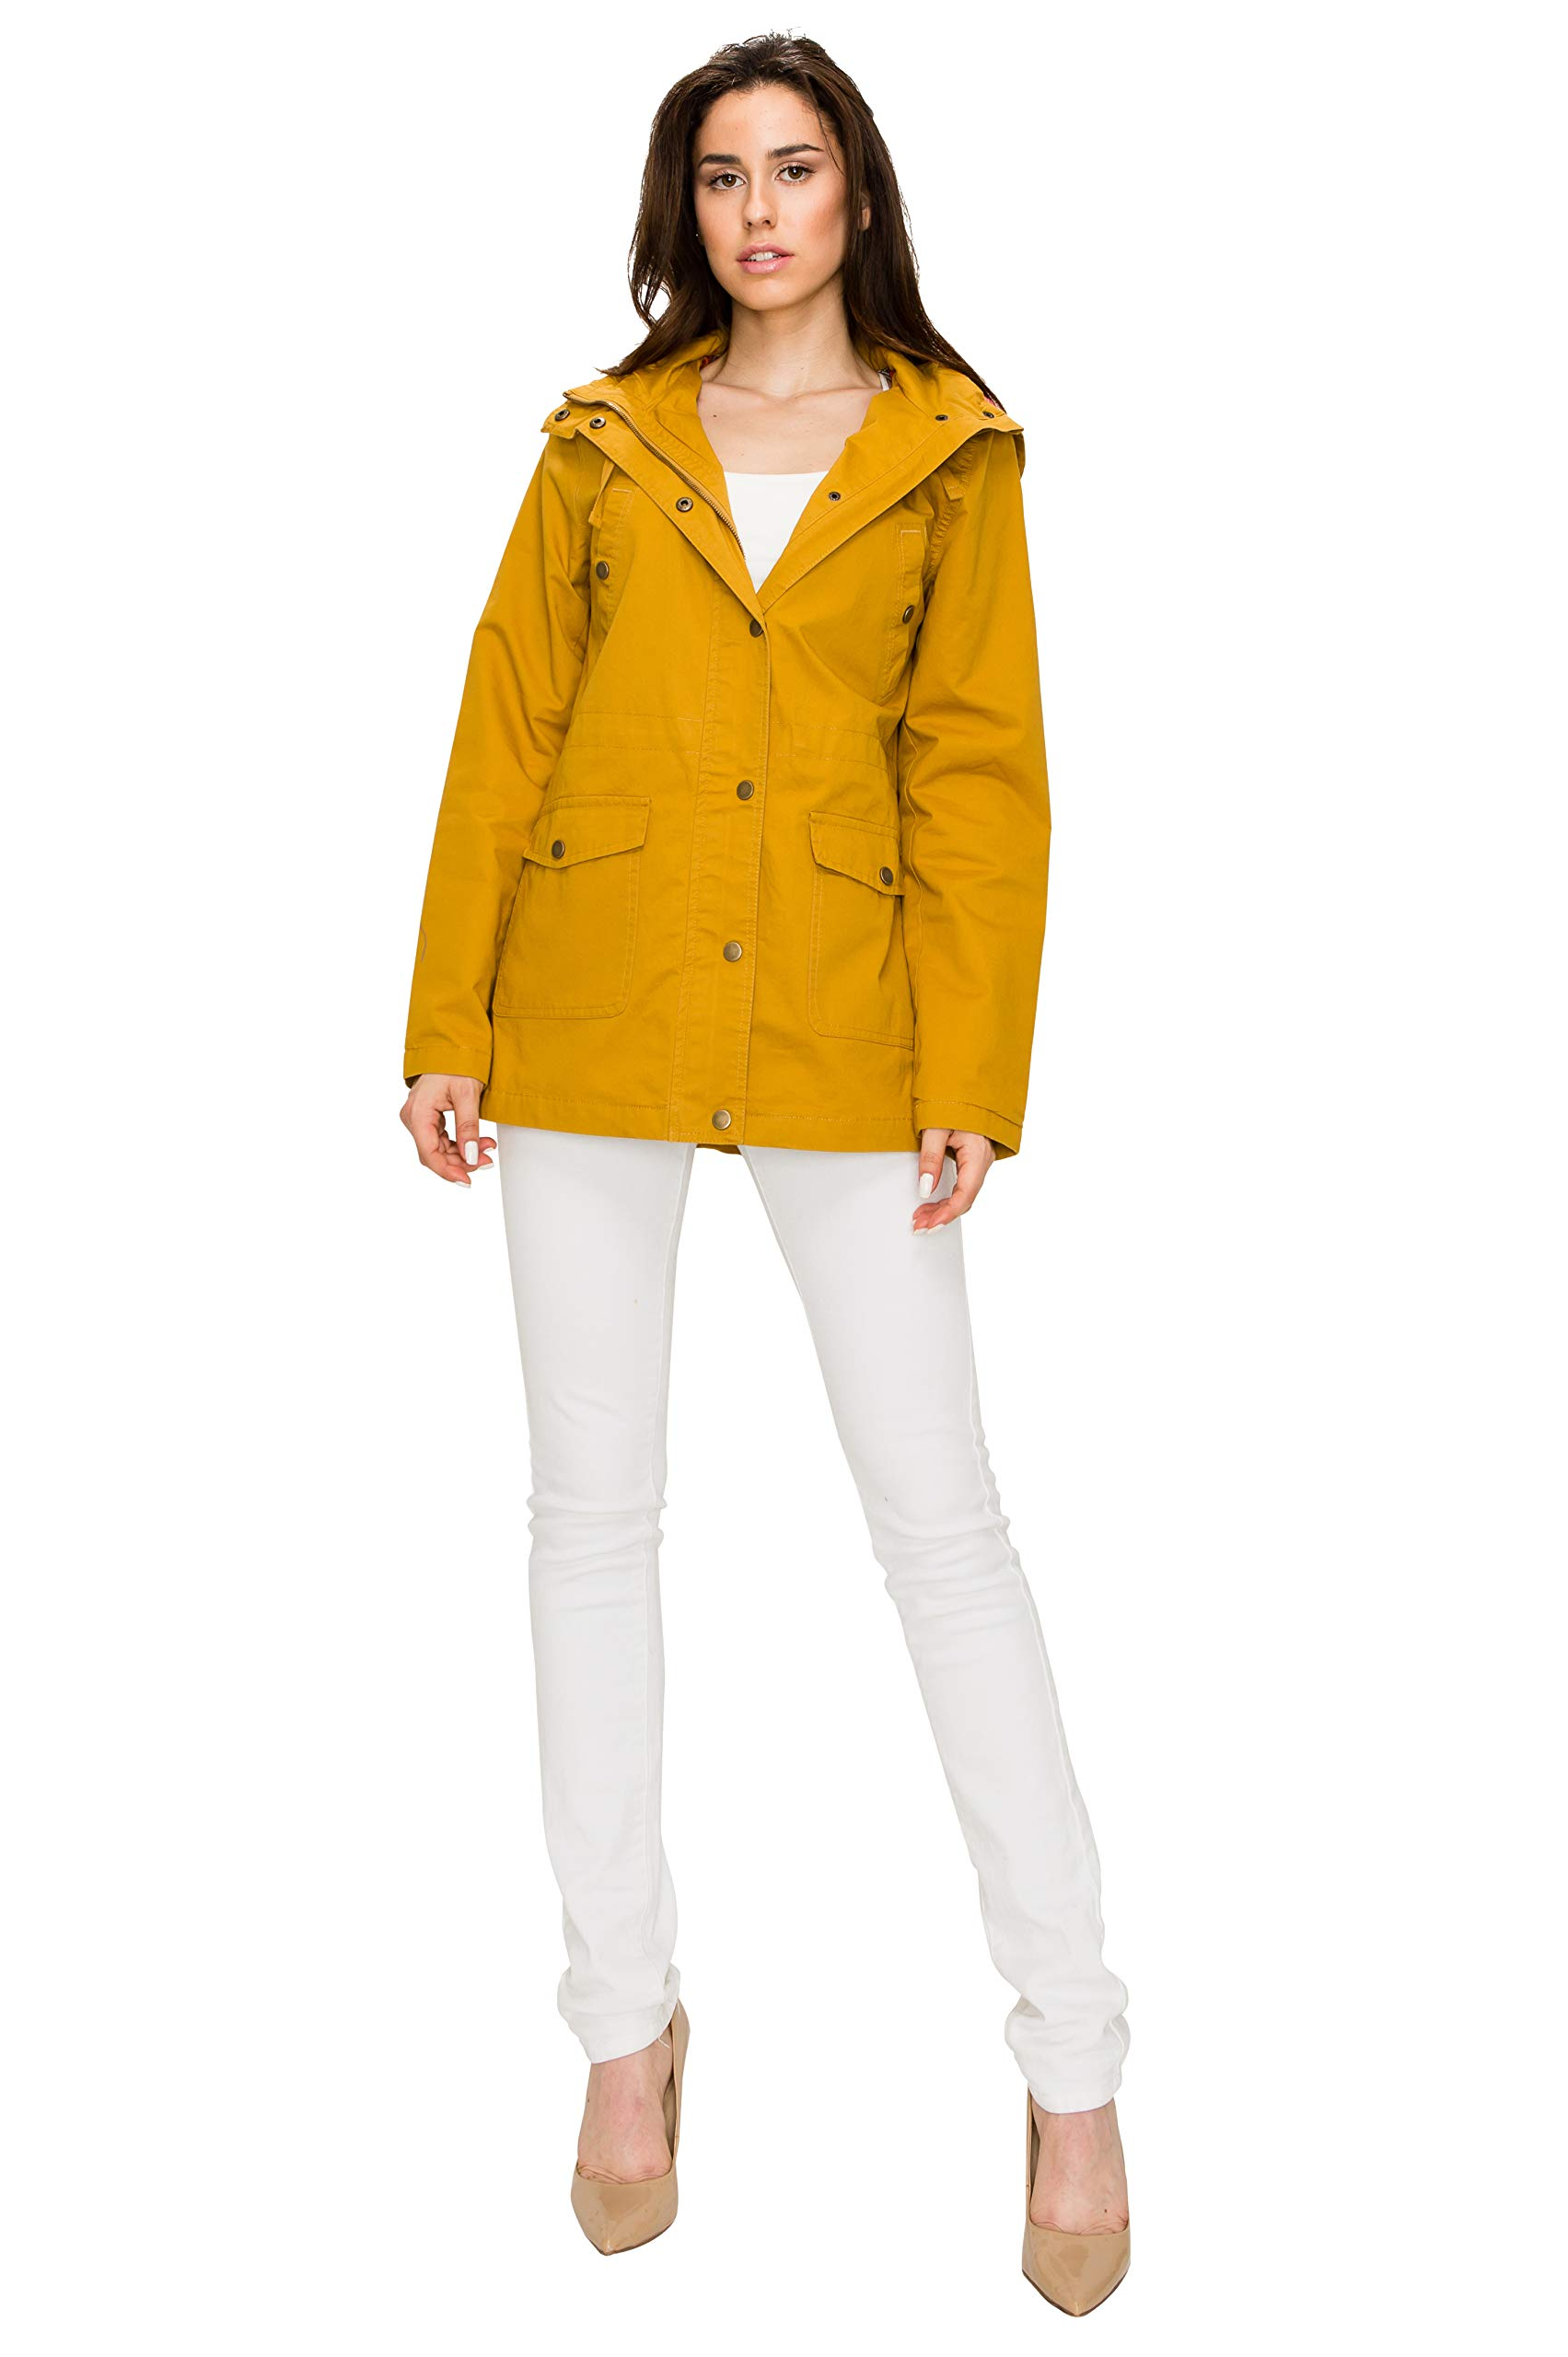 Lock and Love WJC1862 Womens Casual Safari Anorak Jacket with Hoodie 3X Mustard